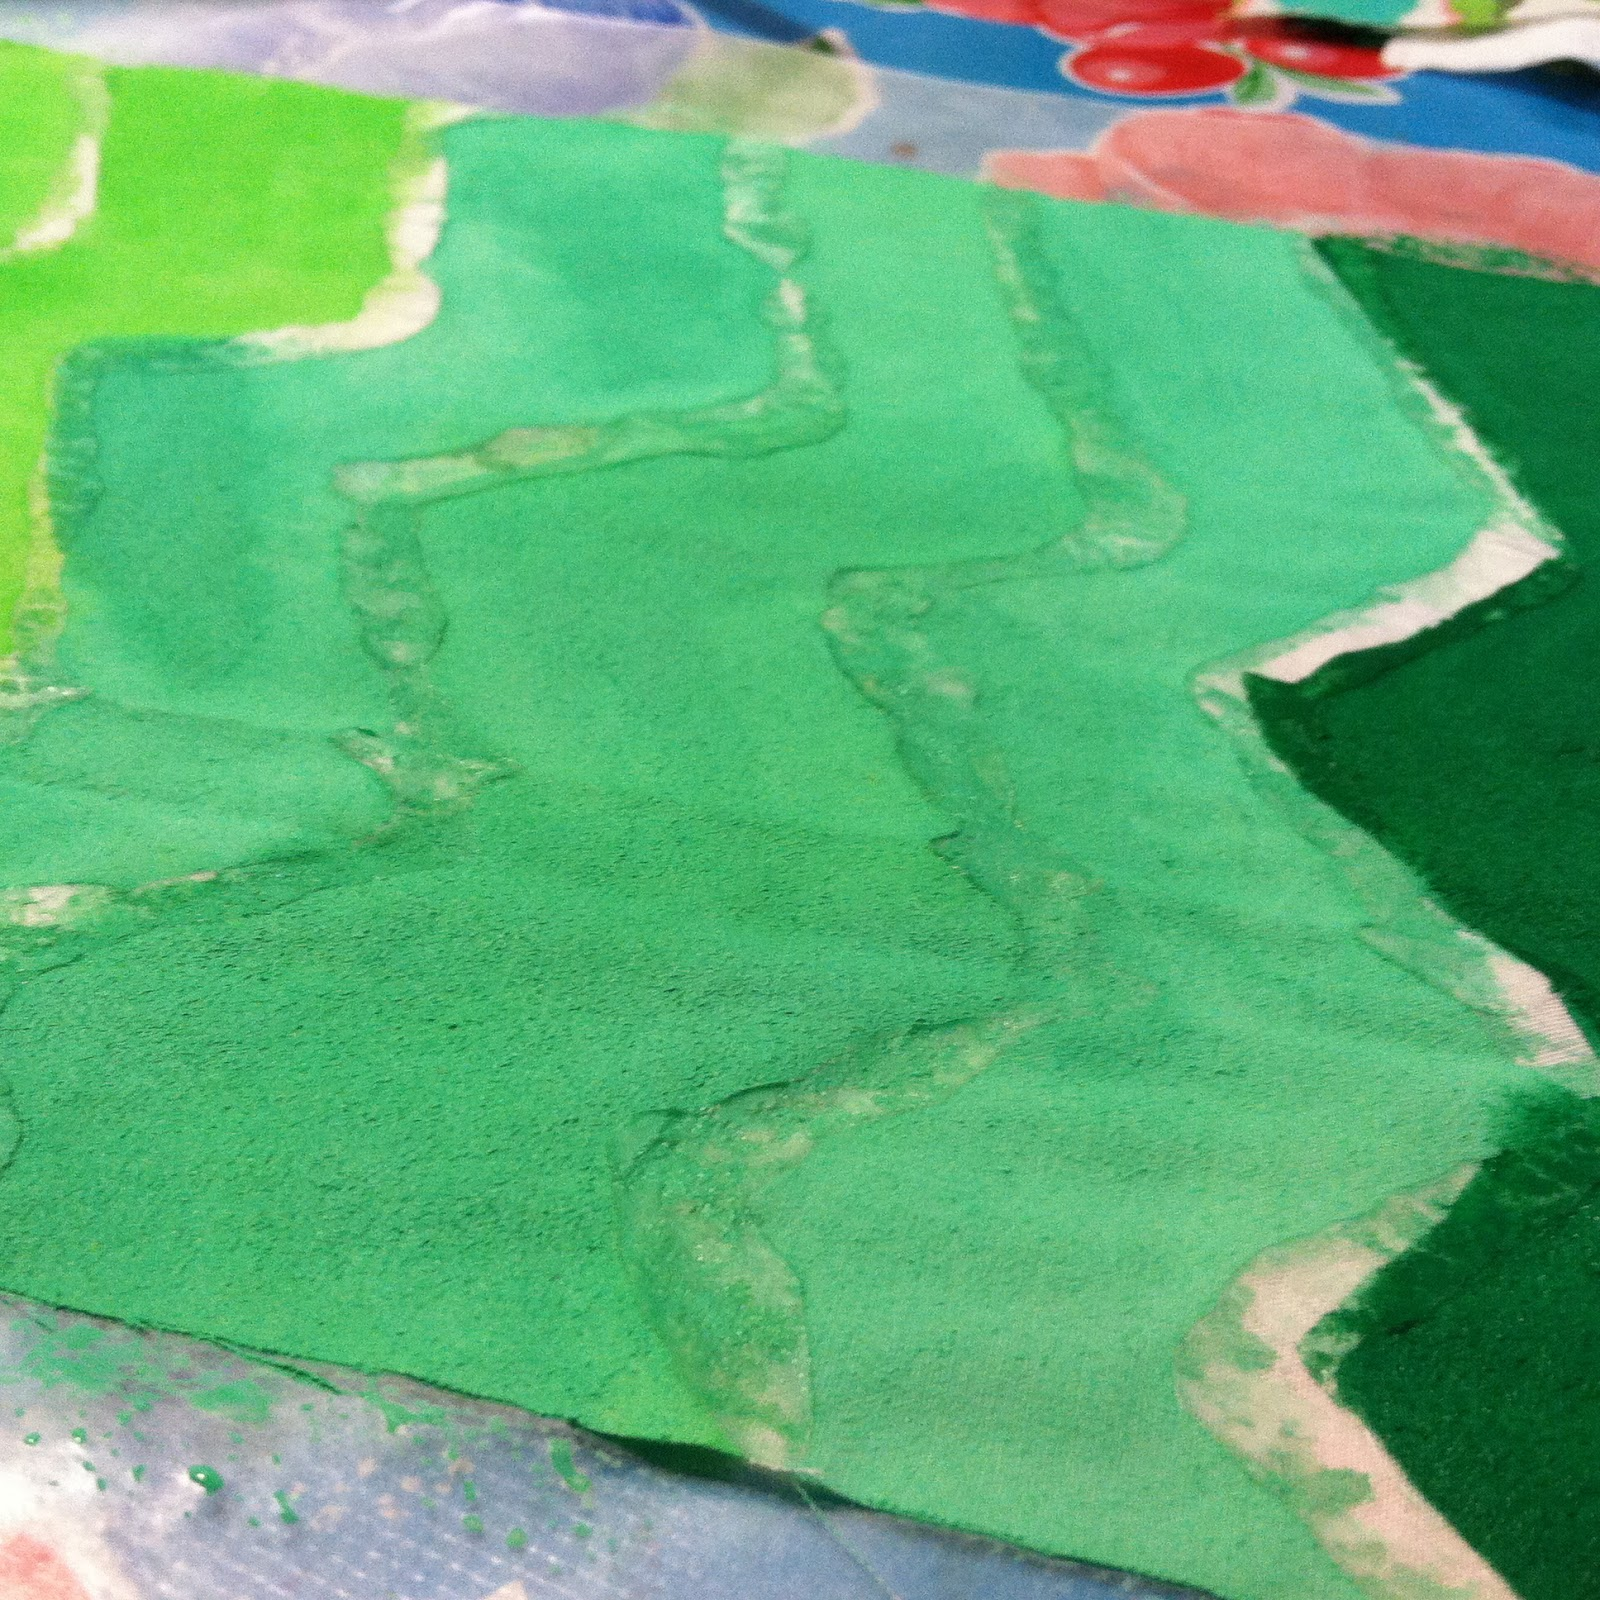 Glue Resist Fabric Prints